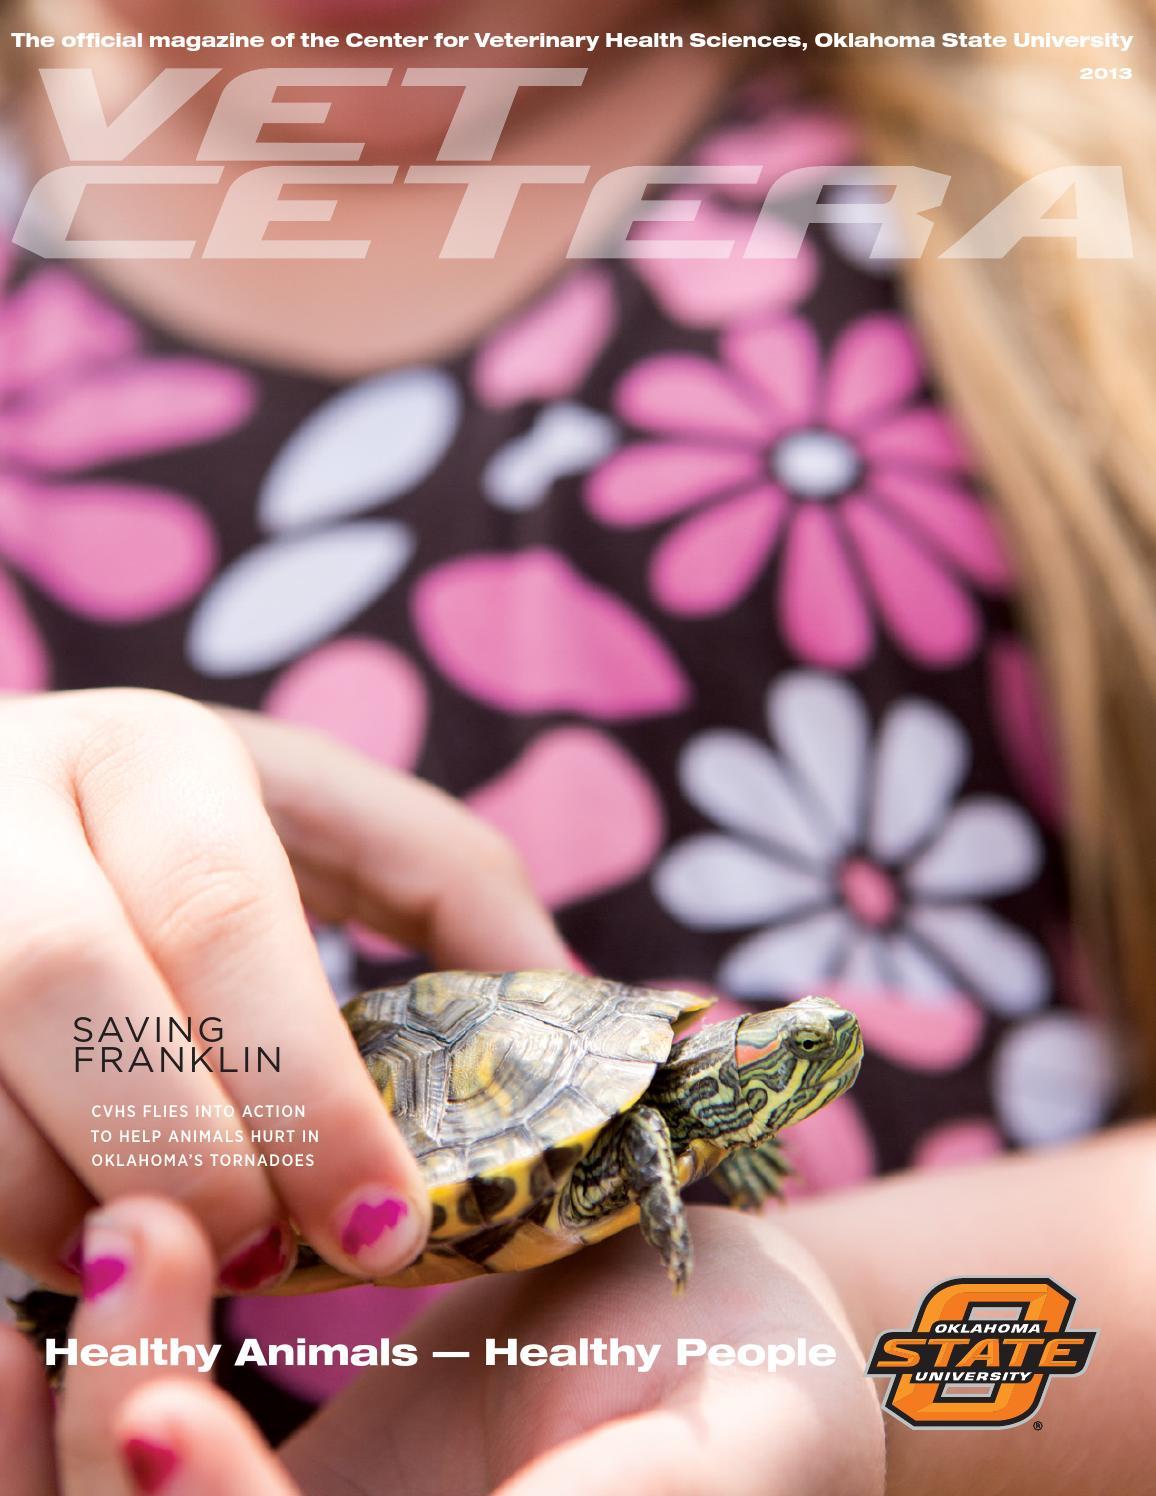 Vet cetera magazine 2013 by Oklahoma State - issuu